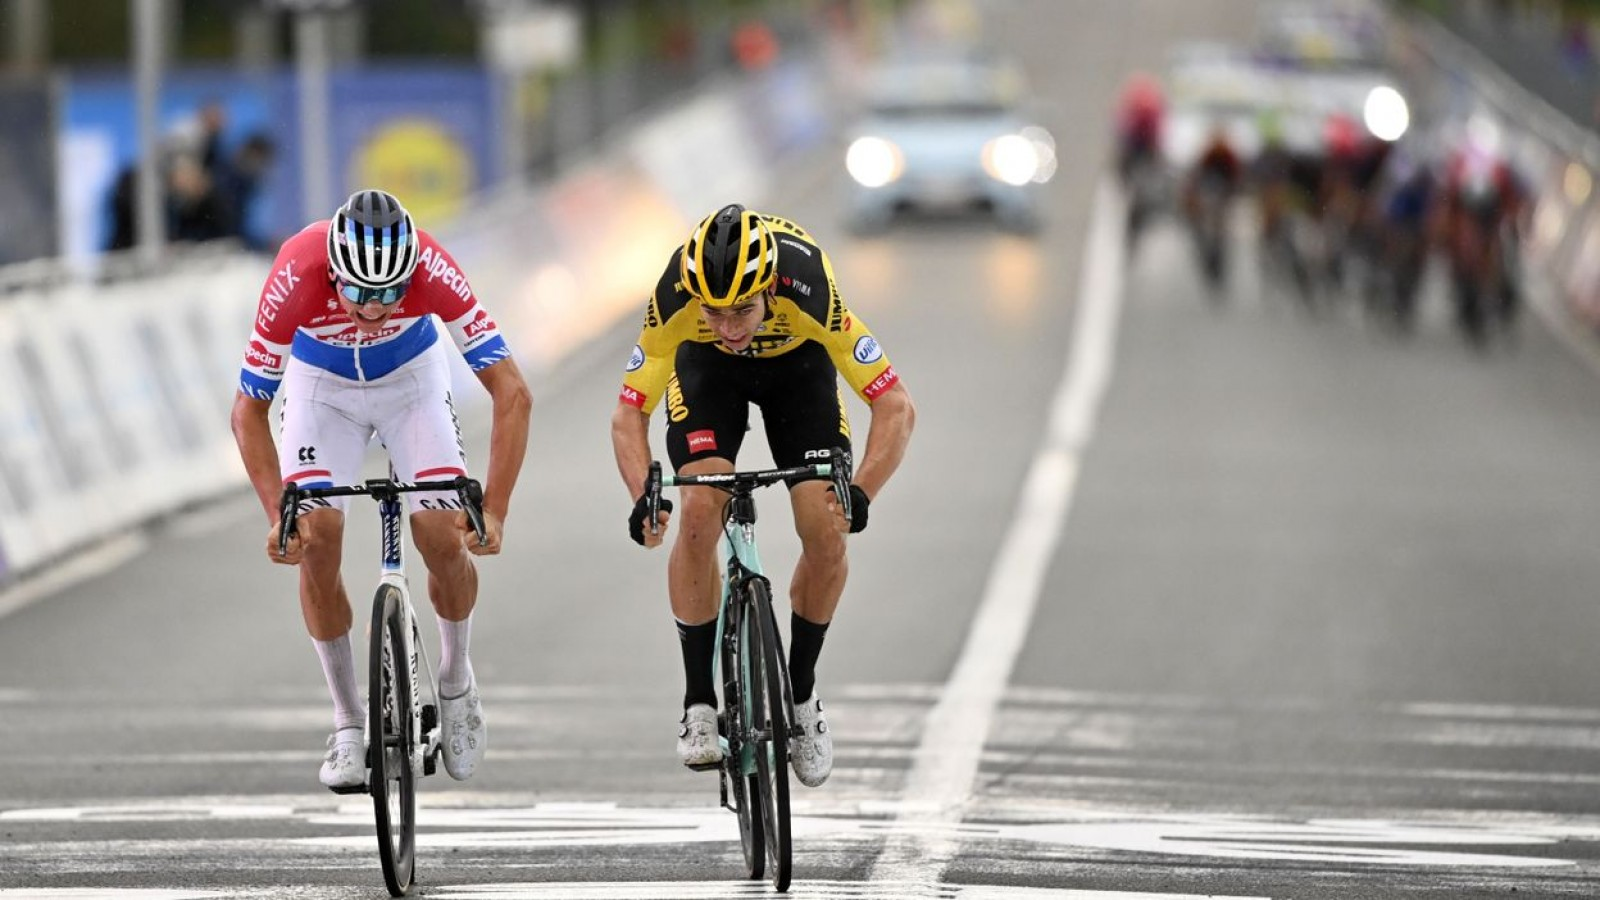 van der poel it was the sprint of my